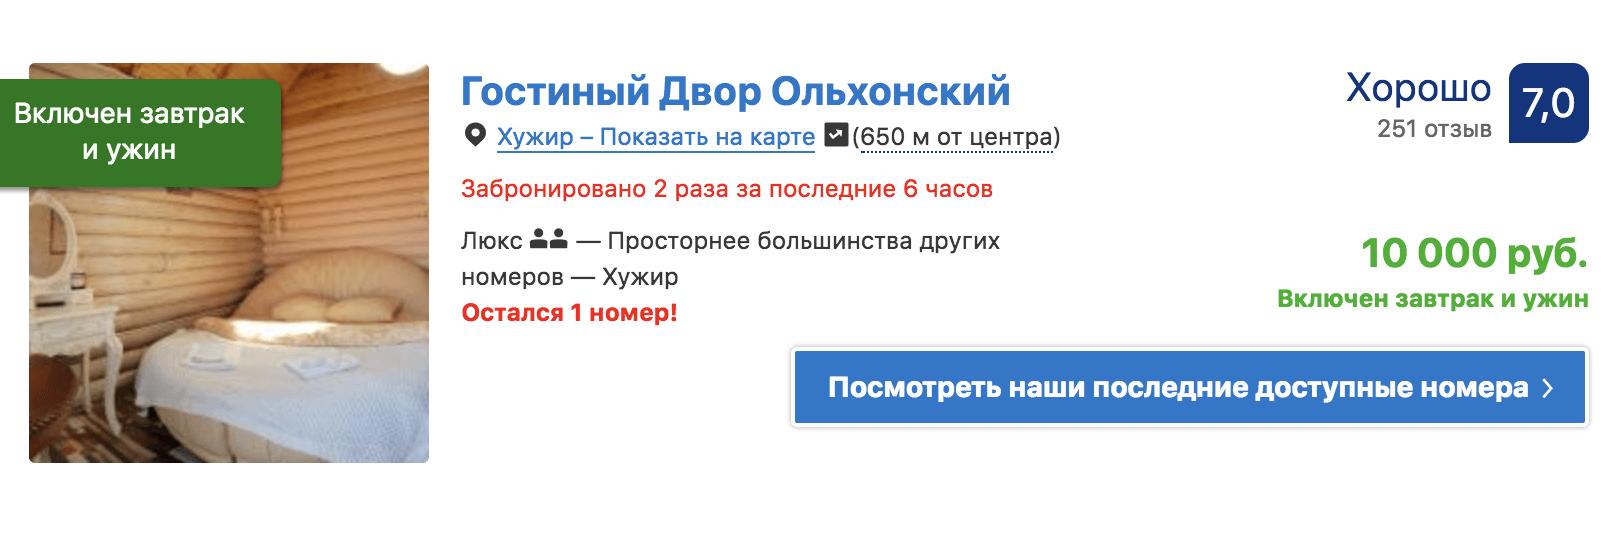 Есть и варианты класса люкс с видом на озеро за 10 000<span class=ruble>Р</span> за ночь